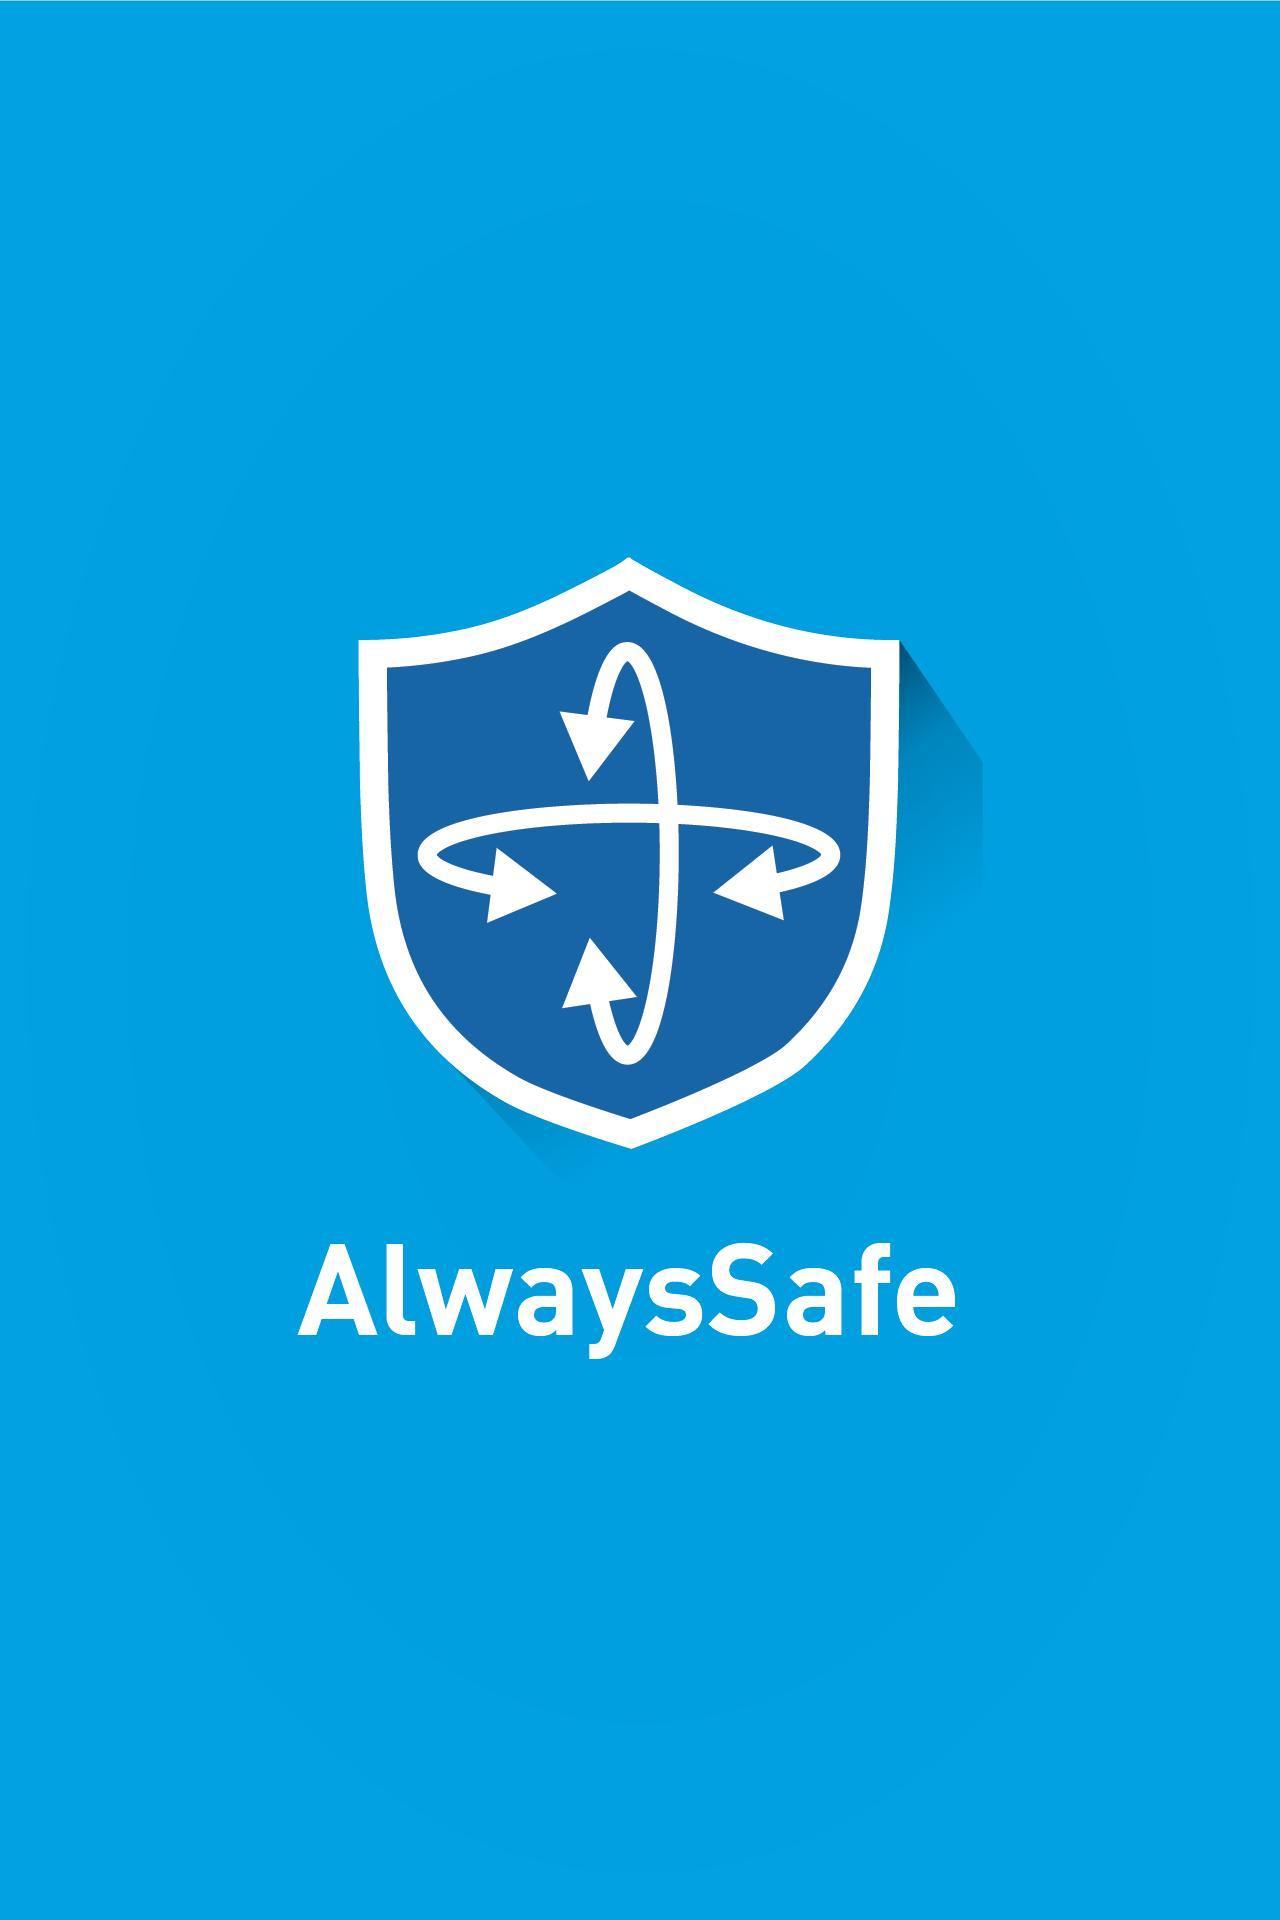 AlwaysSafe for Android - APK Download